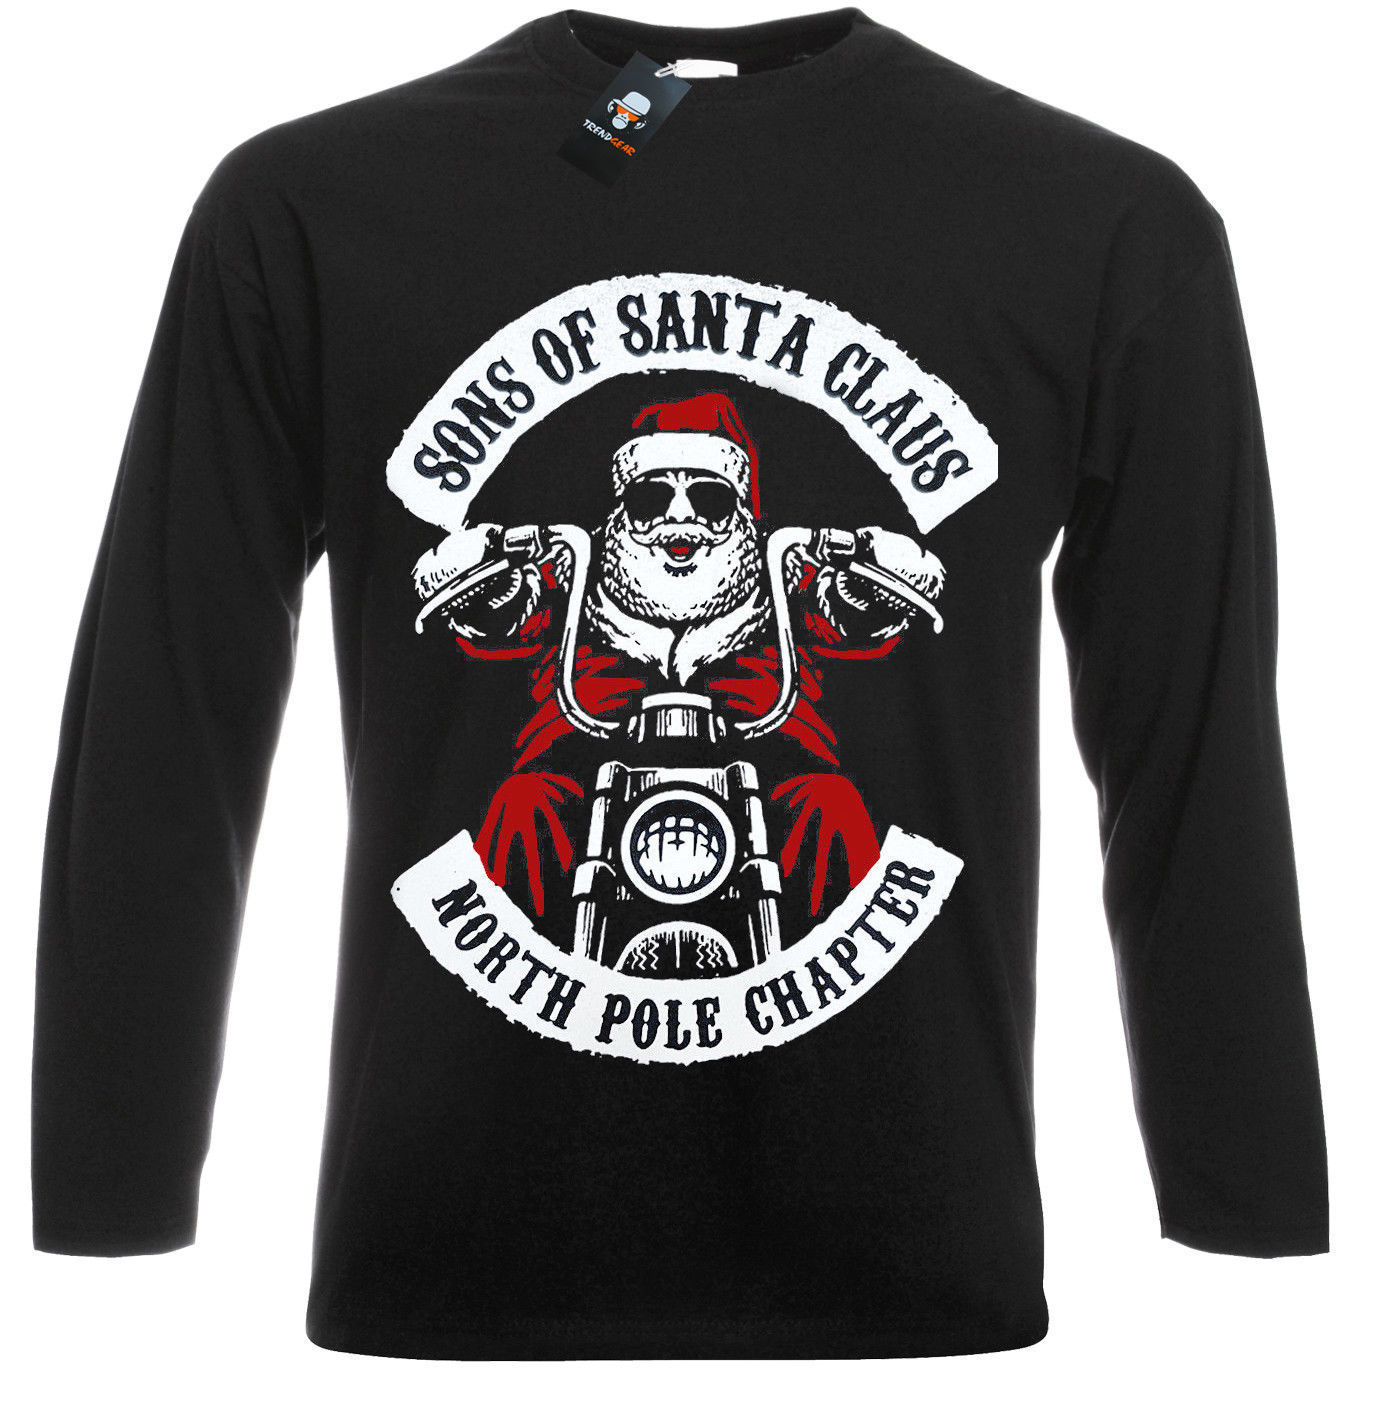 Sons Of Santa Long Sleeve T Shirt/Funny/Biker/Decembeard/Fancy/Christmas/Gift